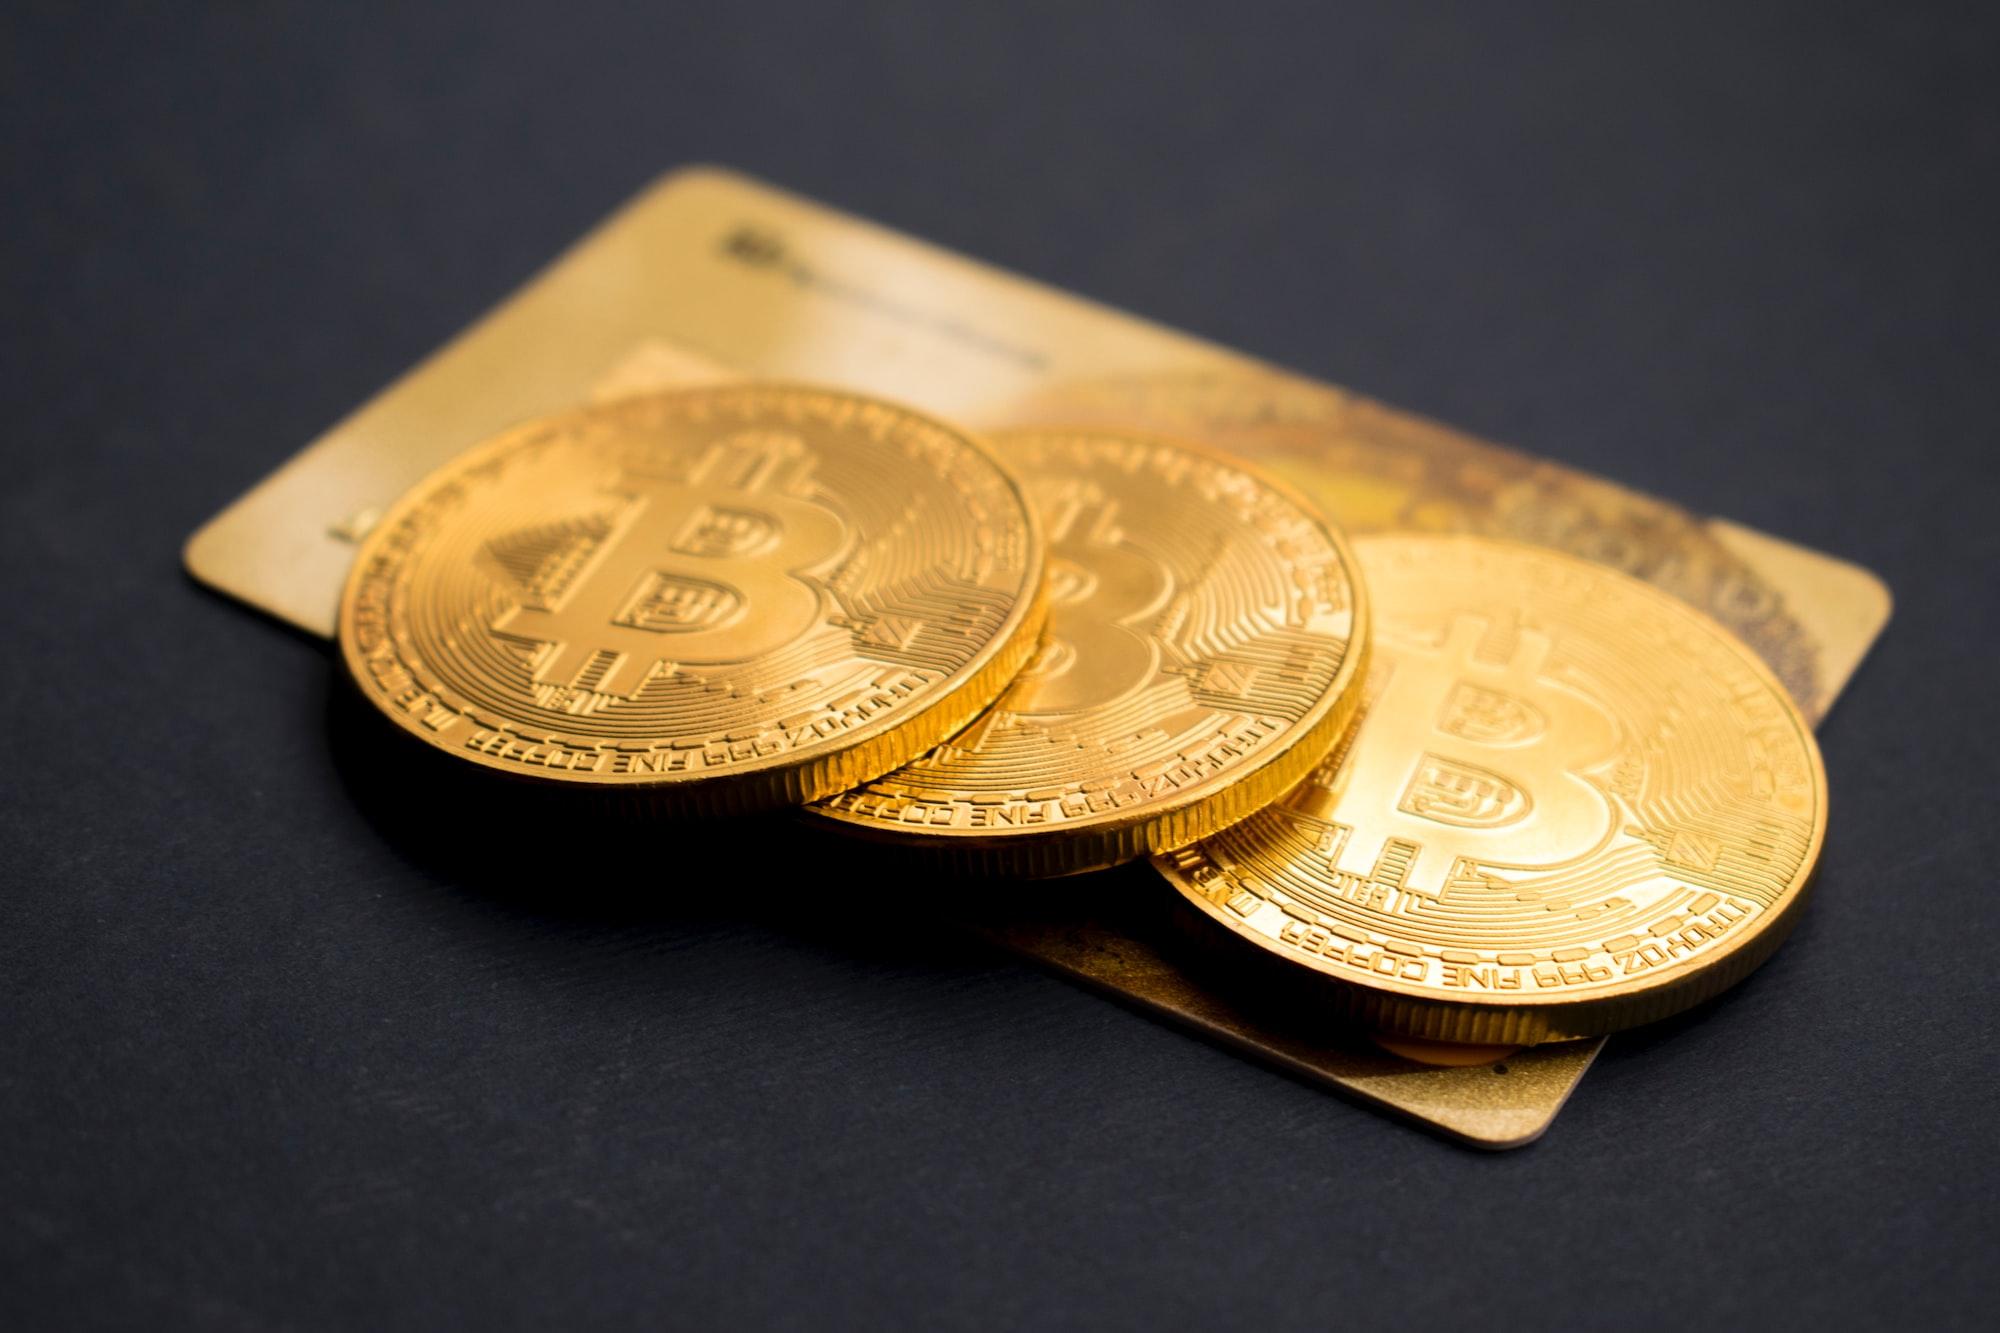 Bogaty jak... Polak. Prezes NBP chce dokupić sto ton złota